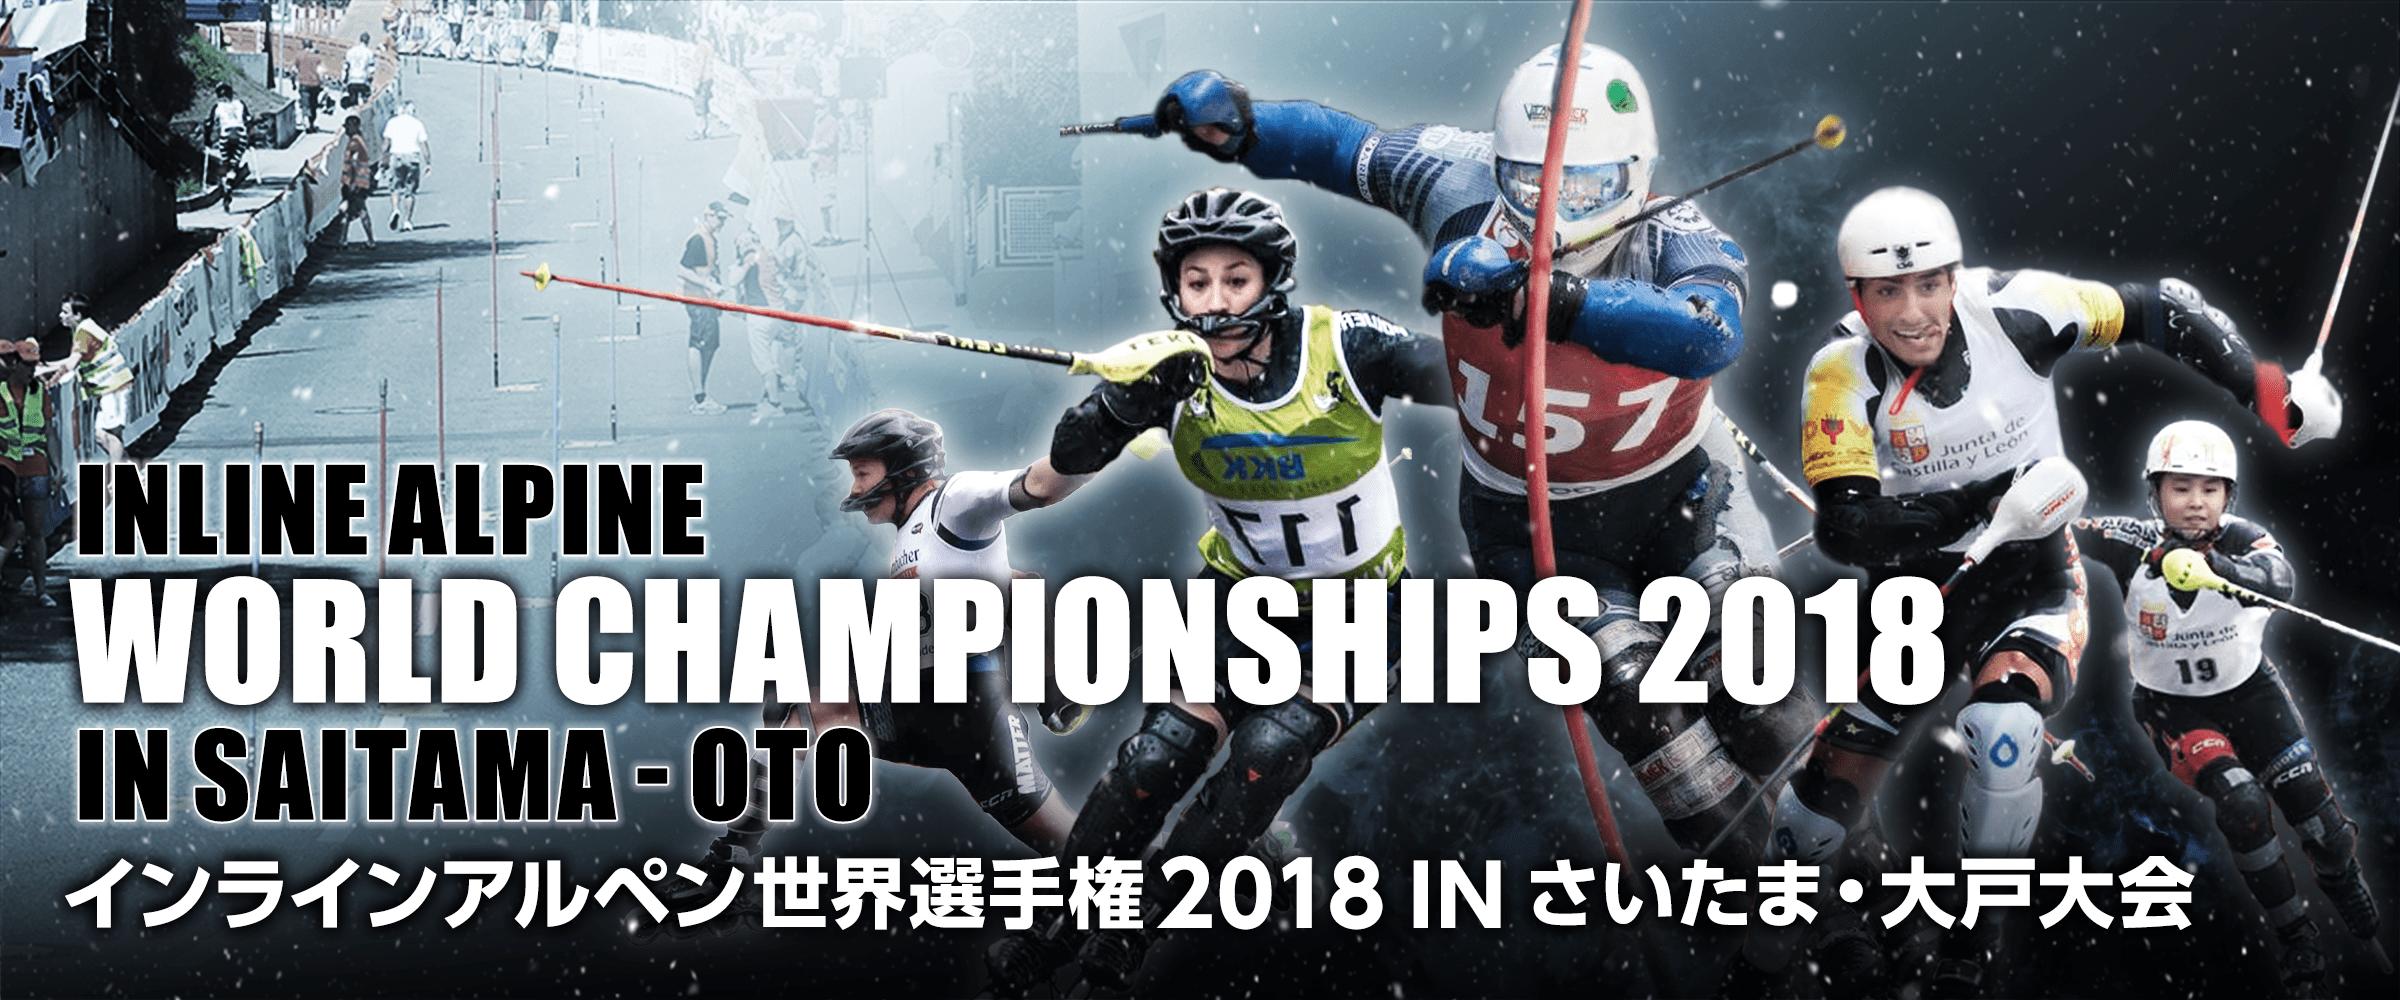 Inline Alpine World Championships 2018 in Saitama-Oto インラインアルペン世界選手権2018 さいたま-大戸大会